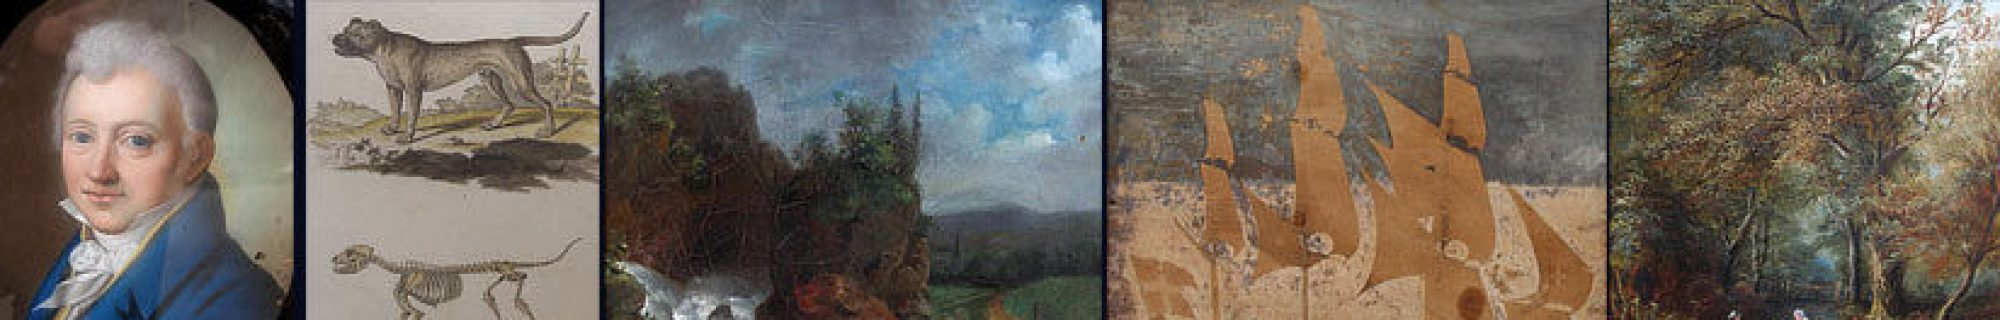 Øbro Art Gallery